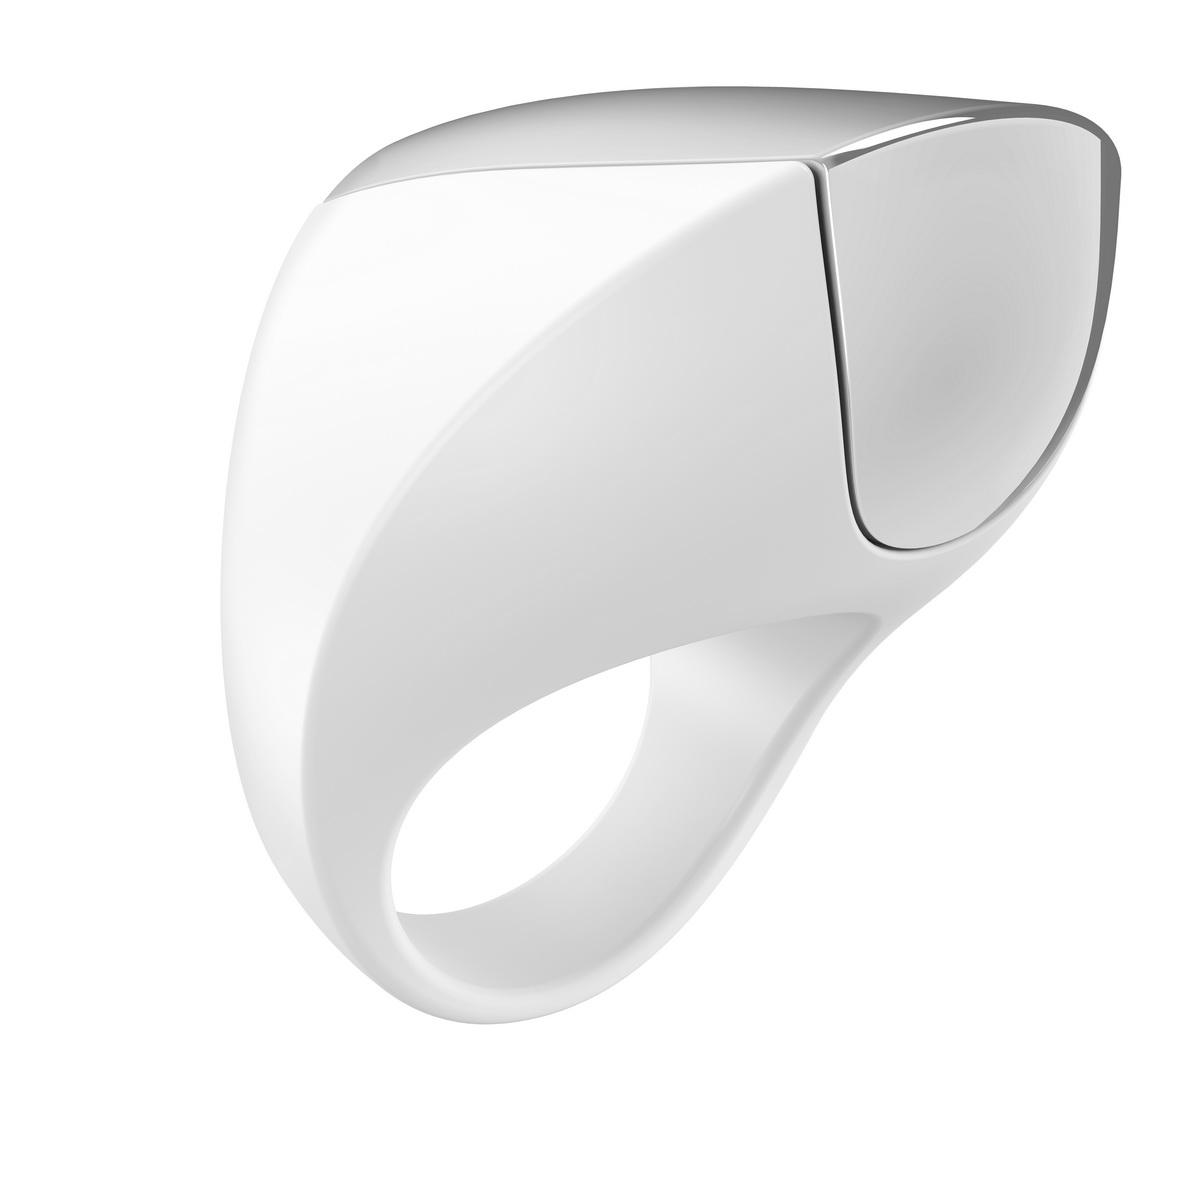 Ovo - A1 dobíjecí erekční kroužek bílý - chrom